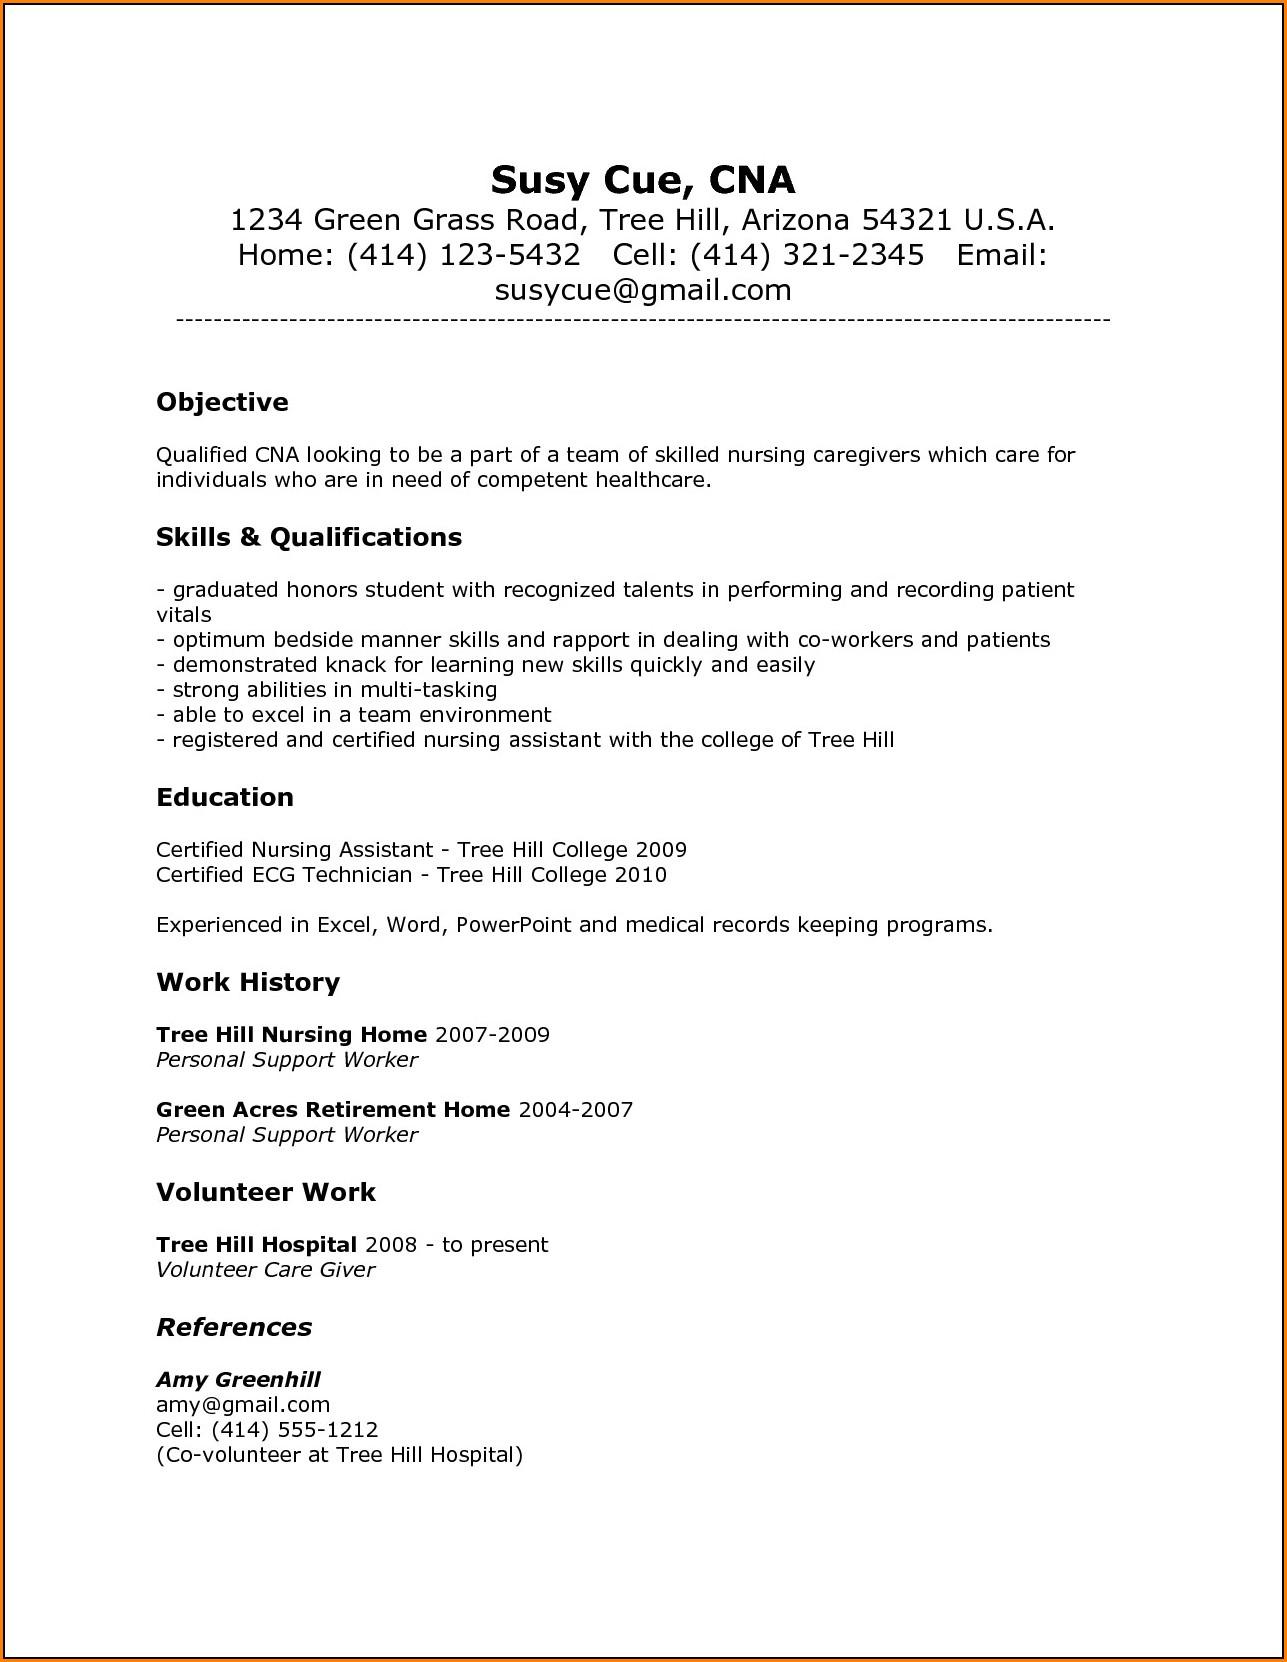 Resume Template For Nursing Assistant